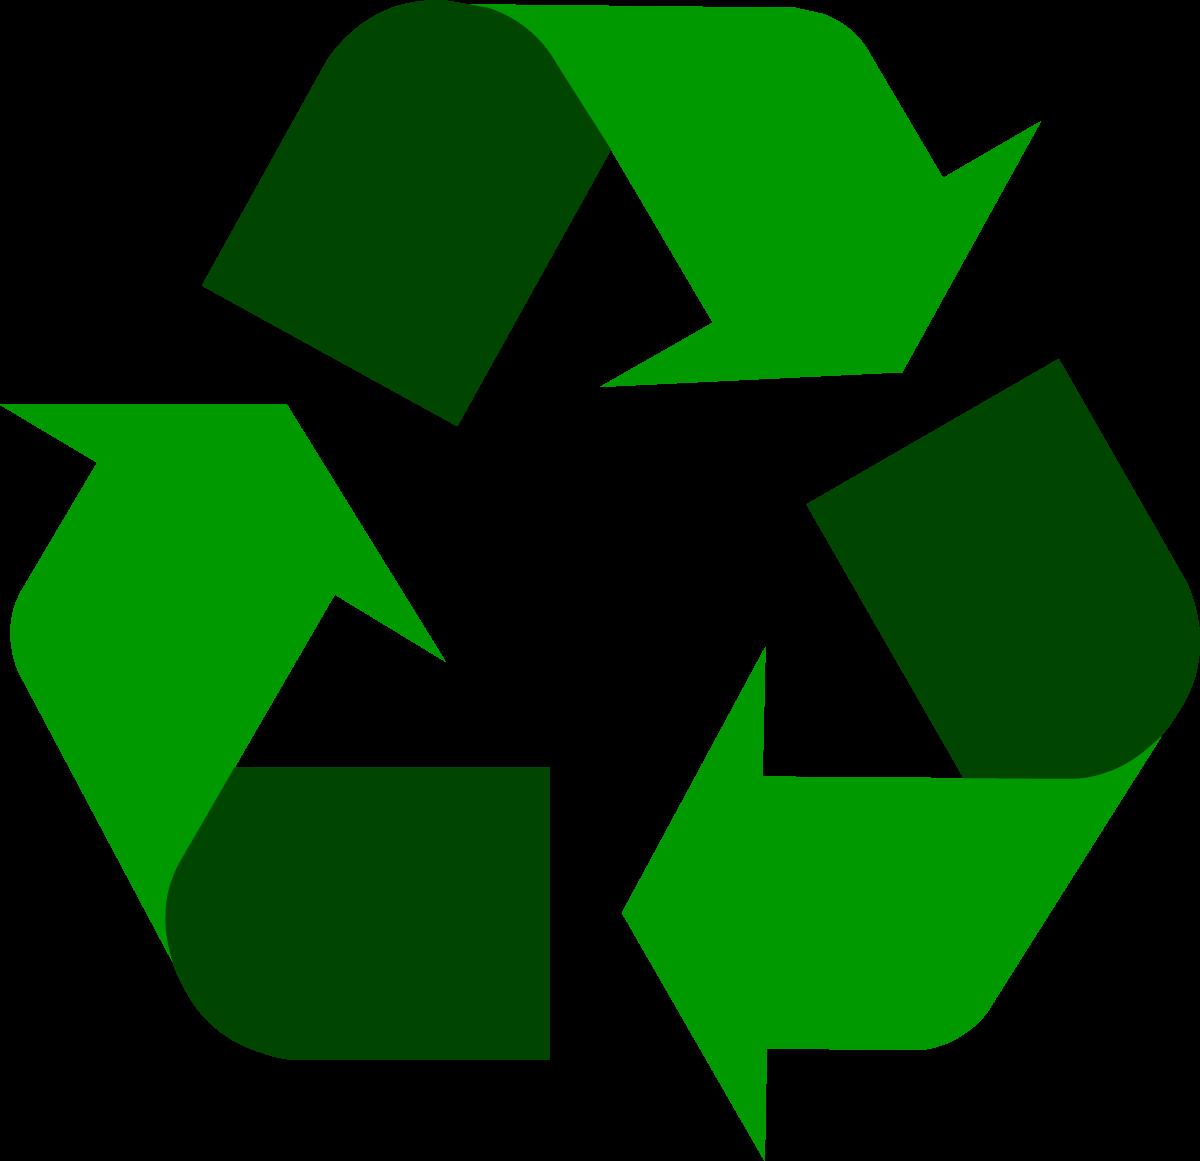 Dark green universal recycling symbol logo sign httpwww dark green universal recycling symbol logo sign http biocorpaavc